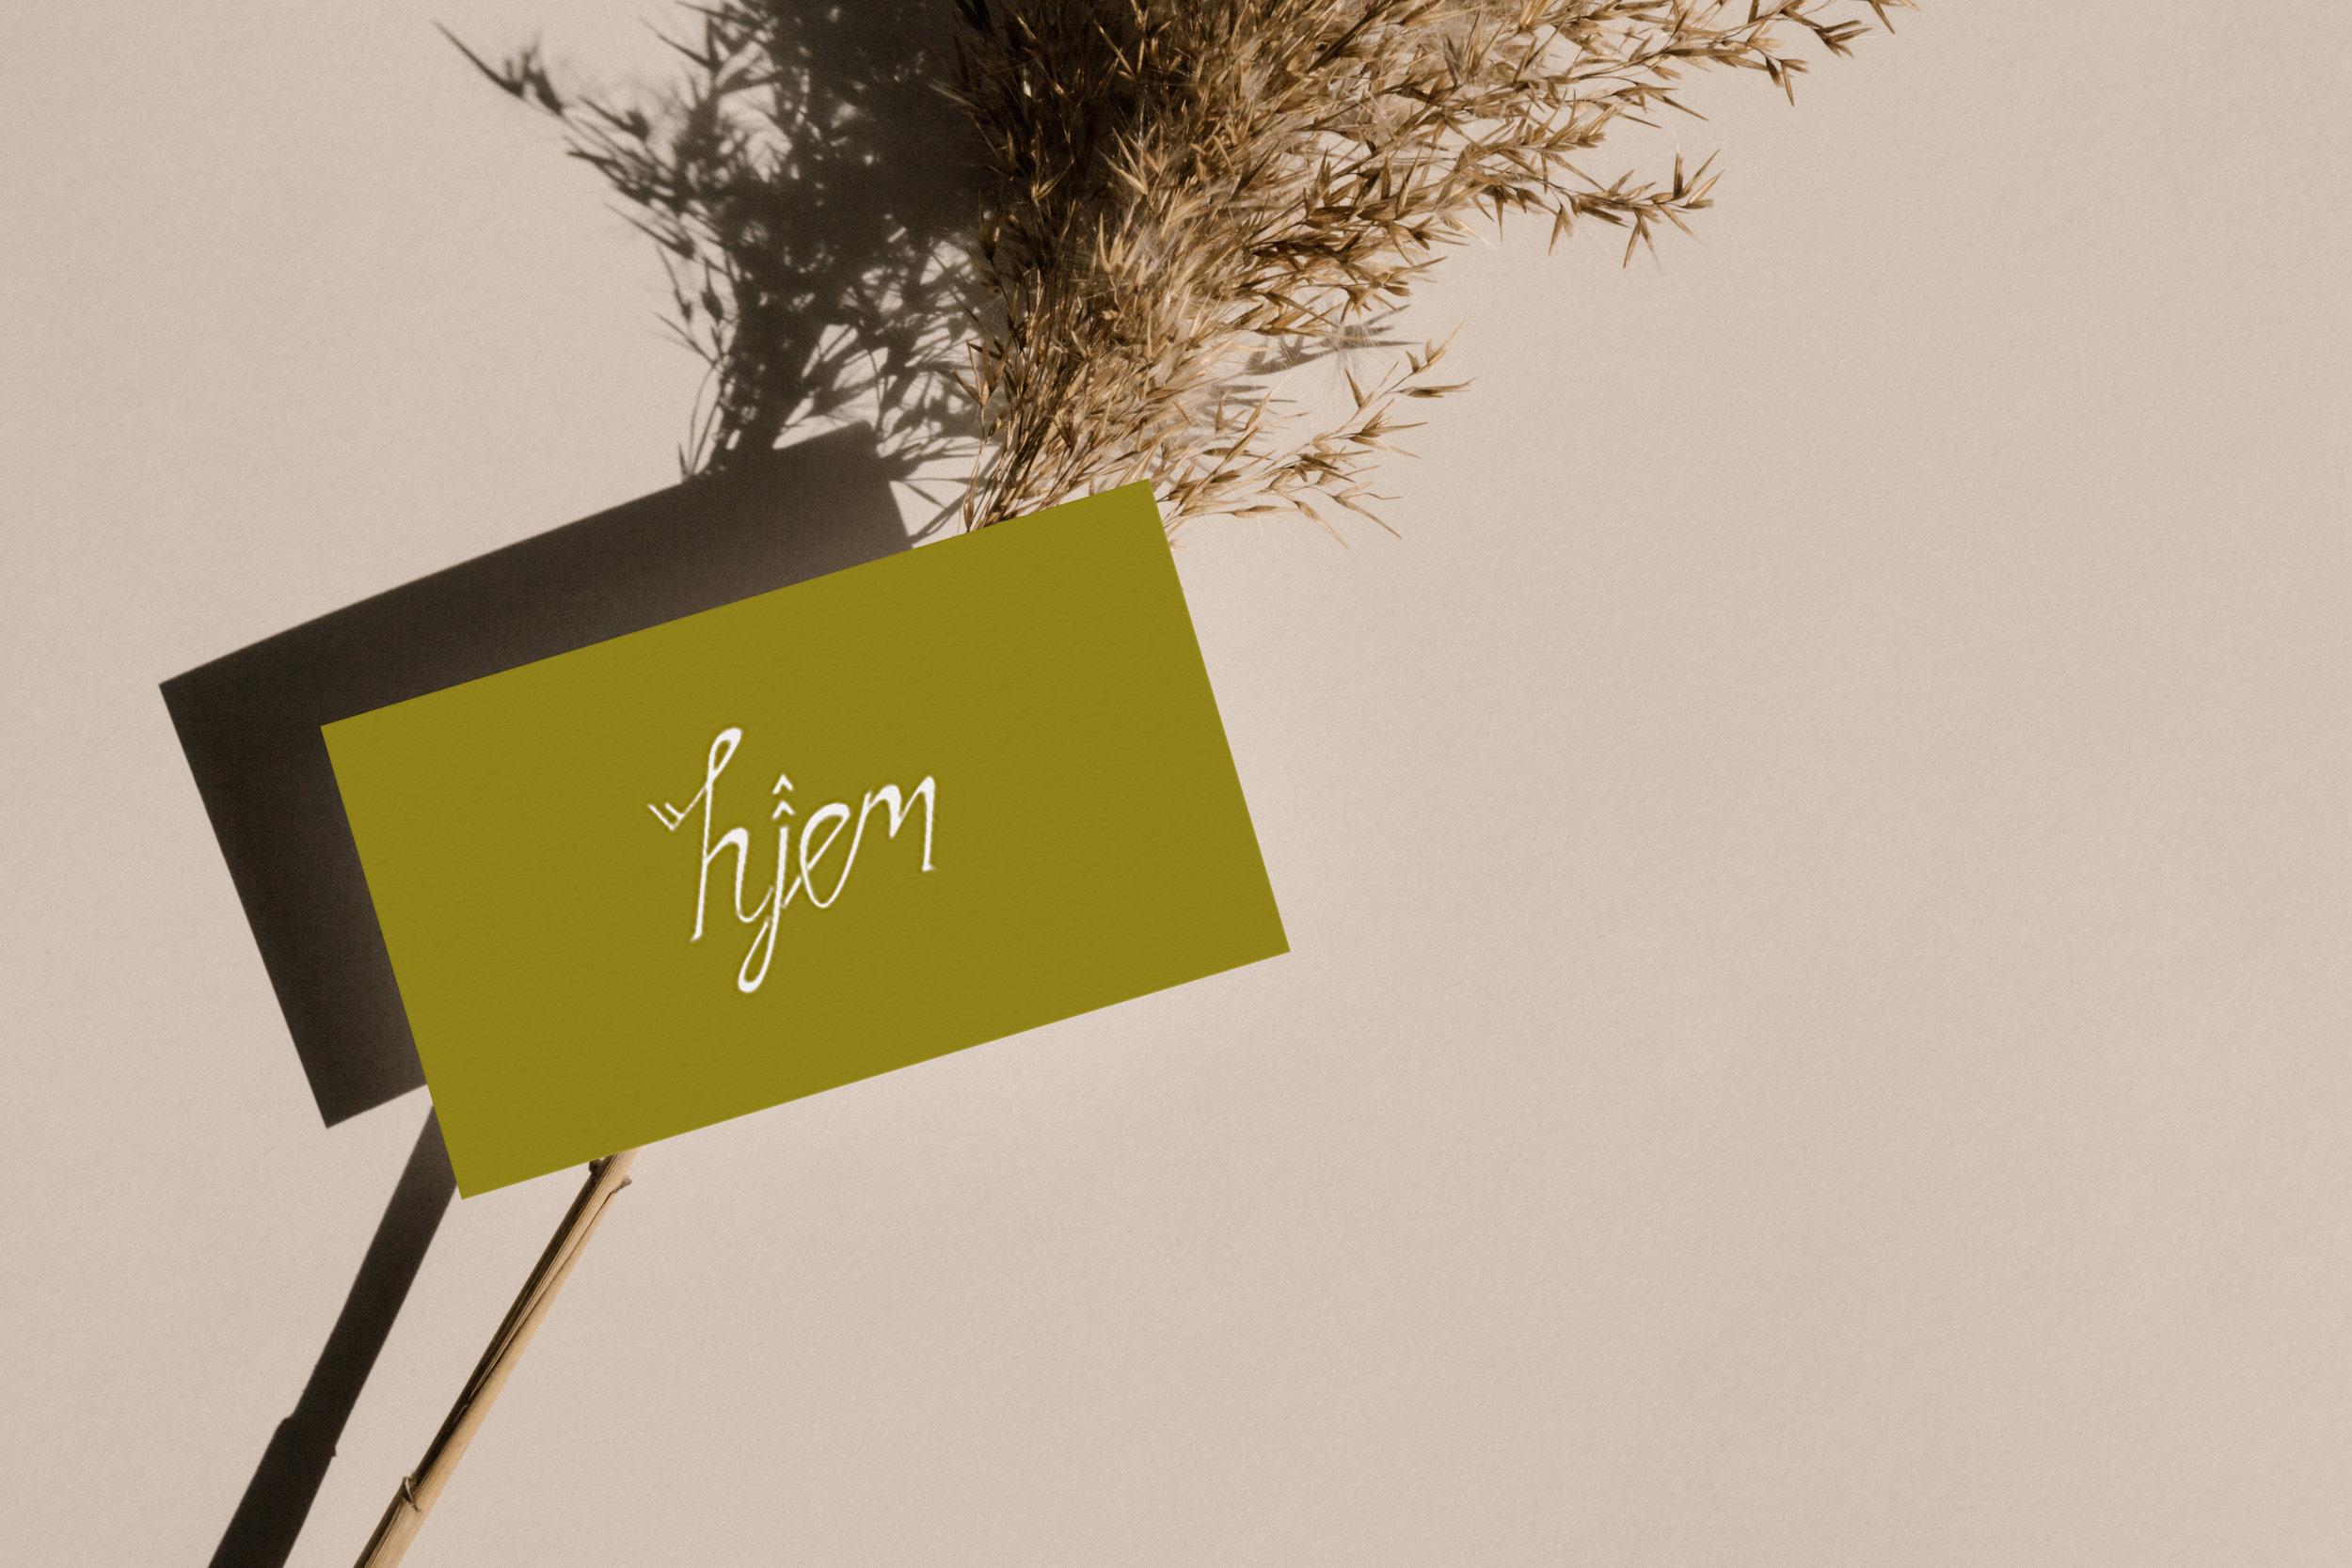 Business Card Mockup Hjem.jpg